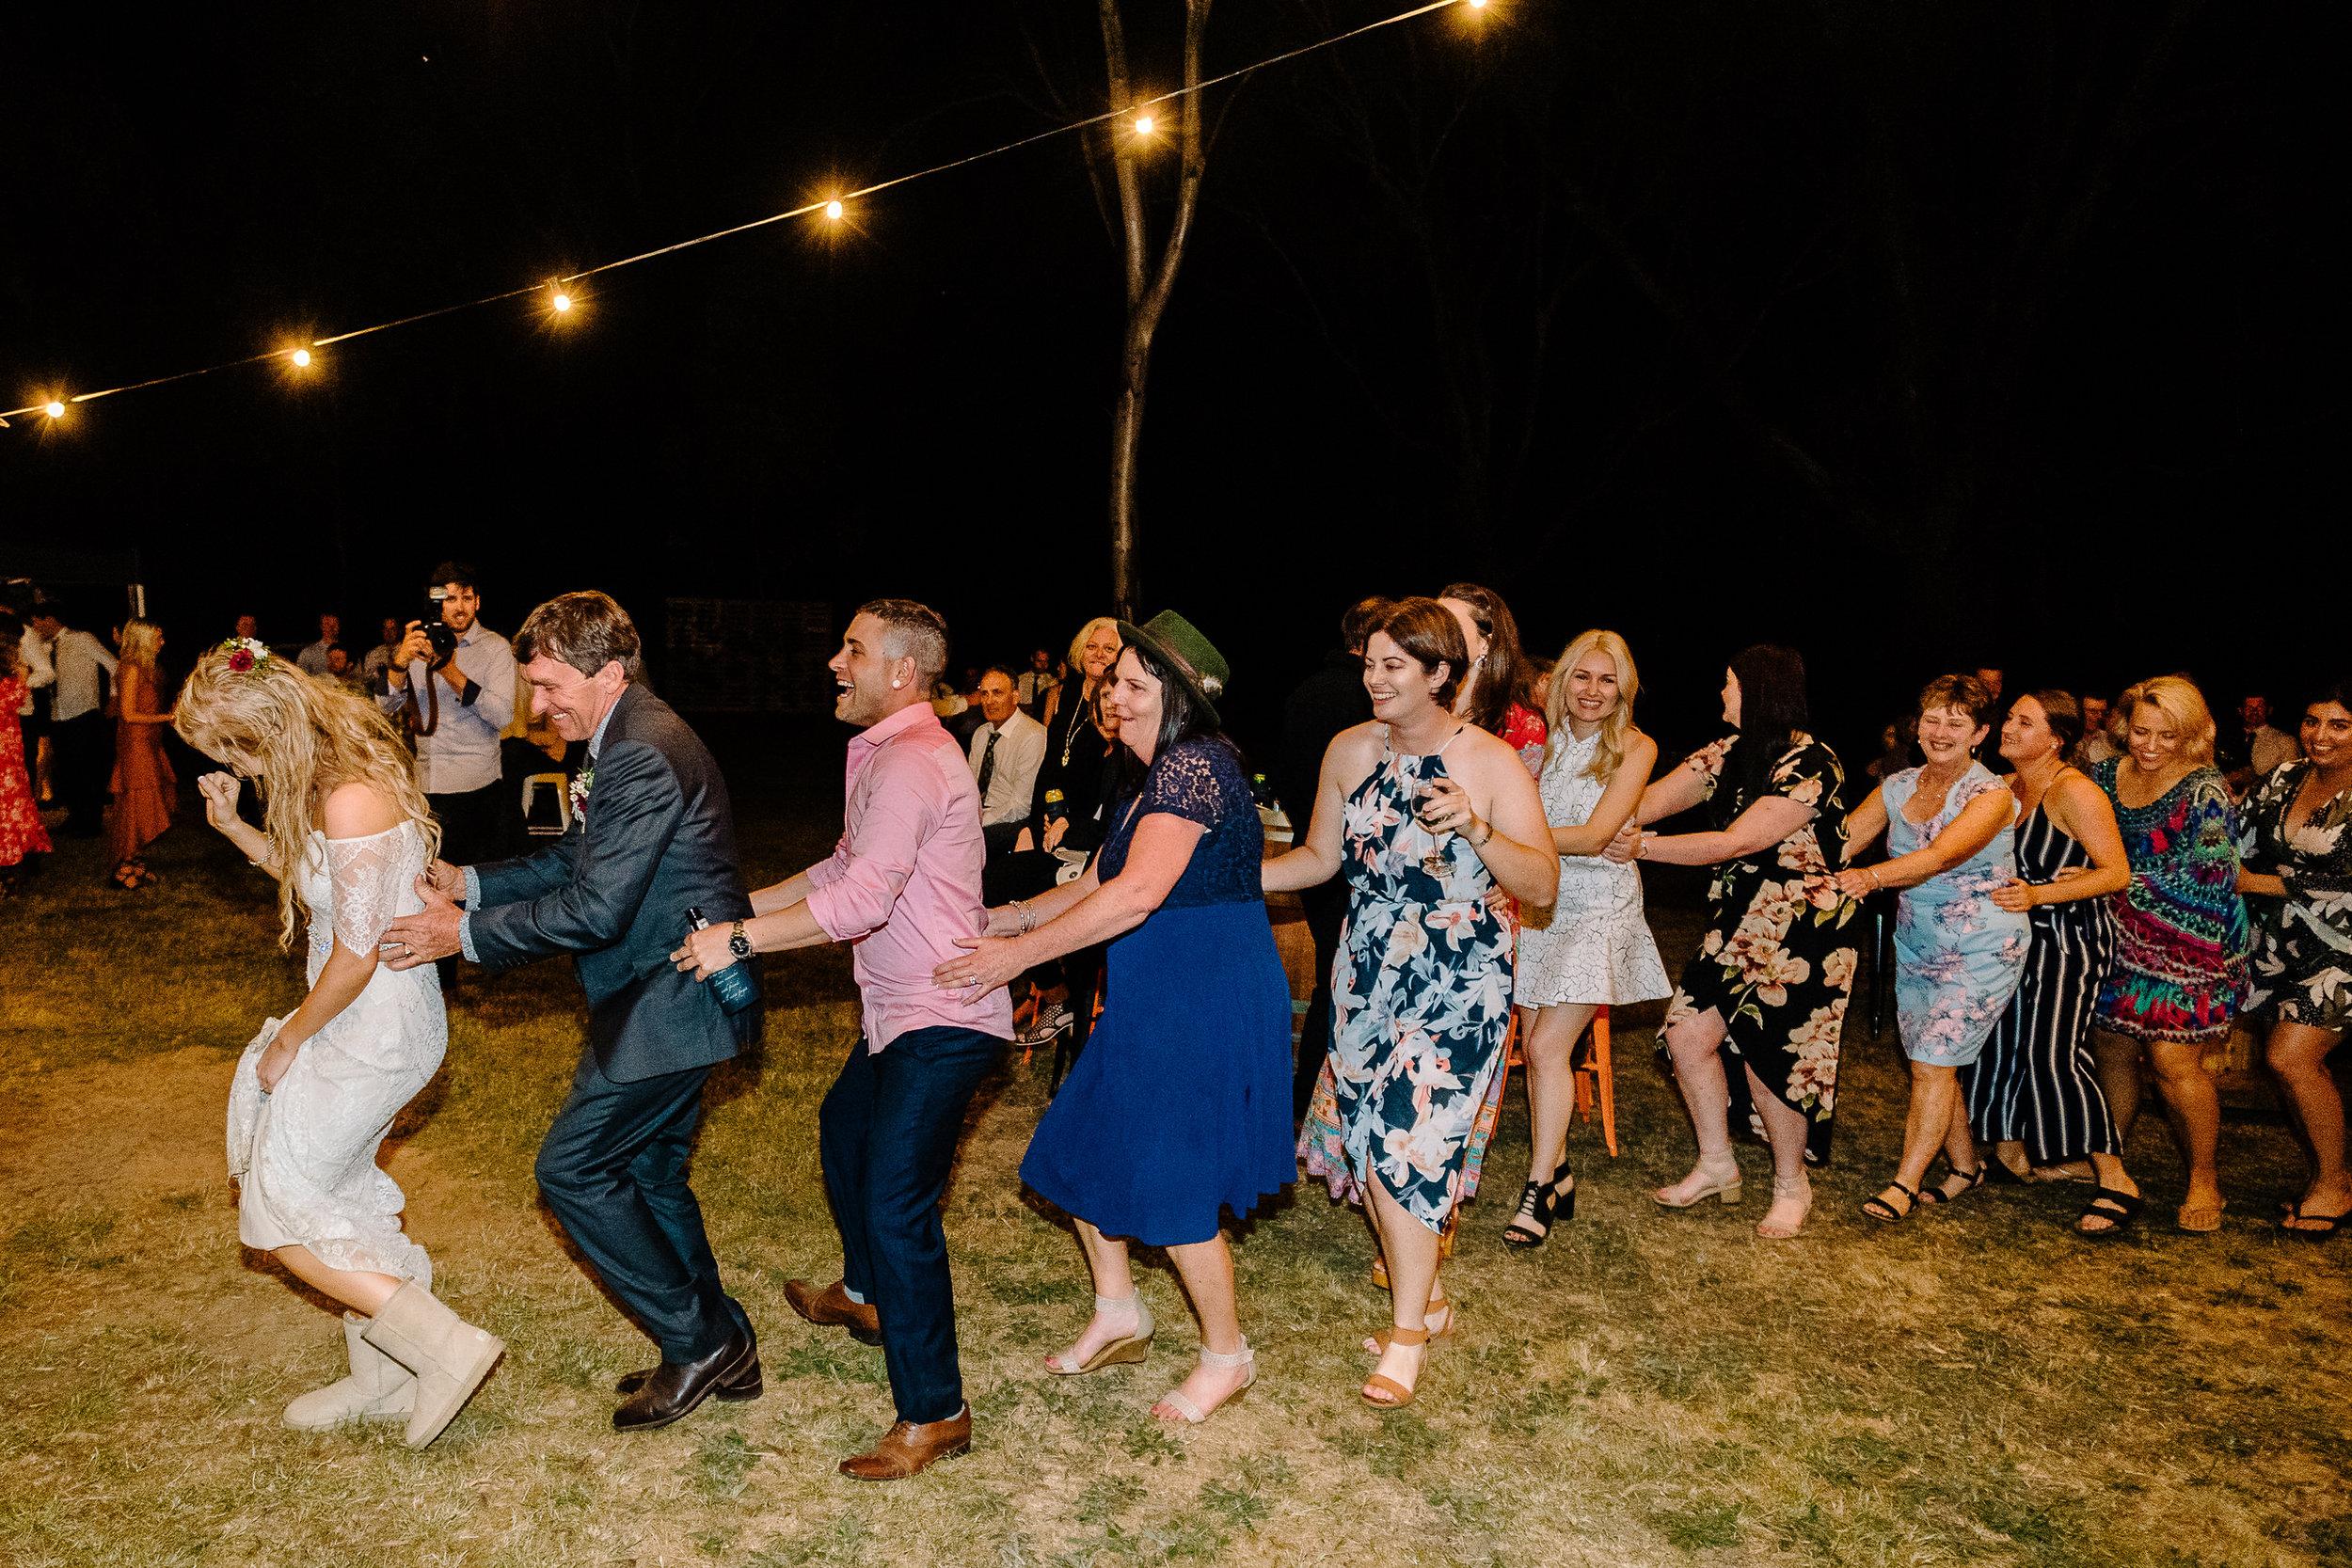 Justin_And_Jim_Photography_Backyard_Wedding246.JPG